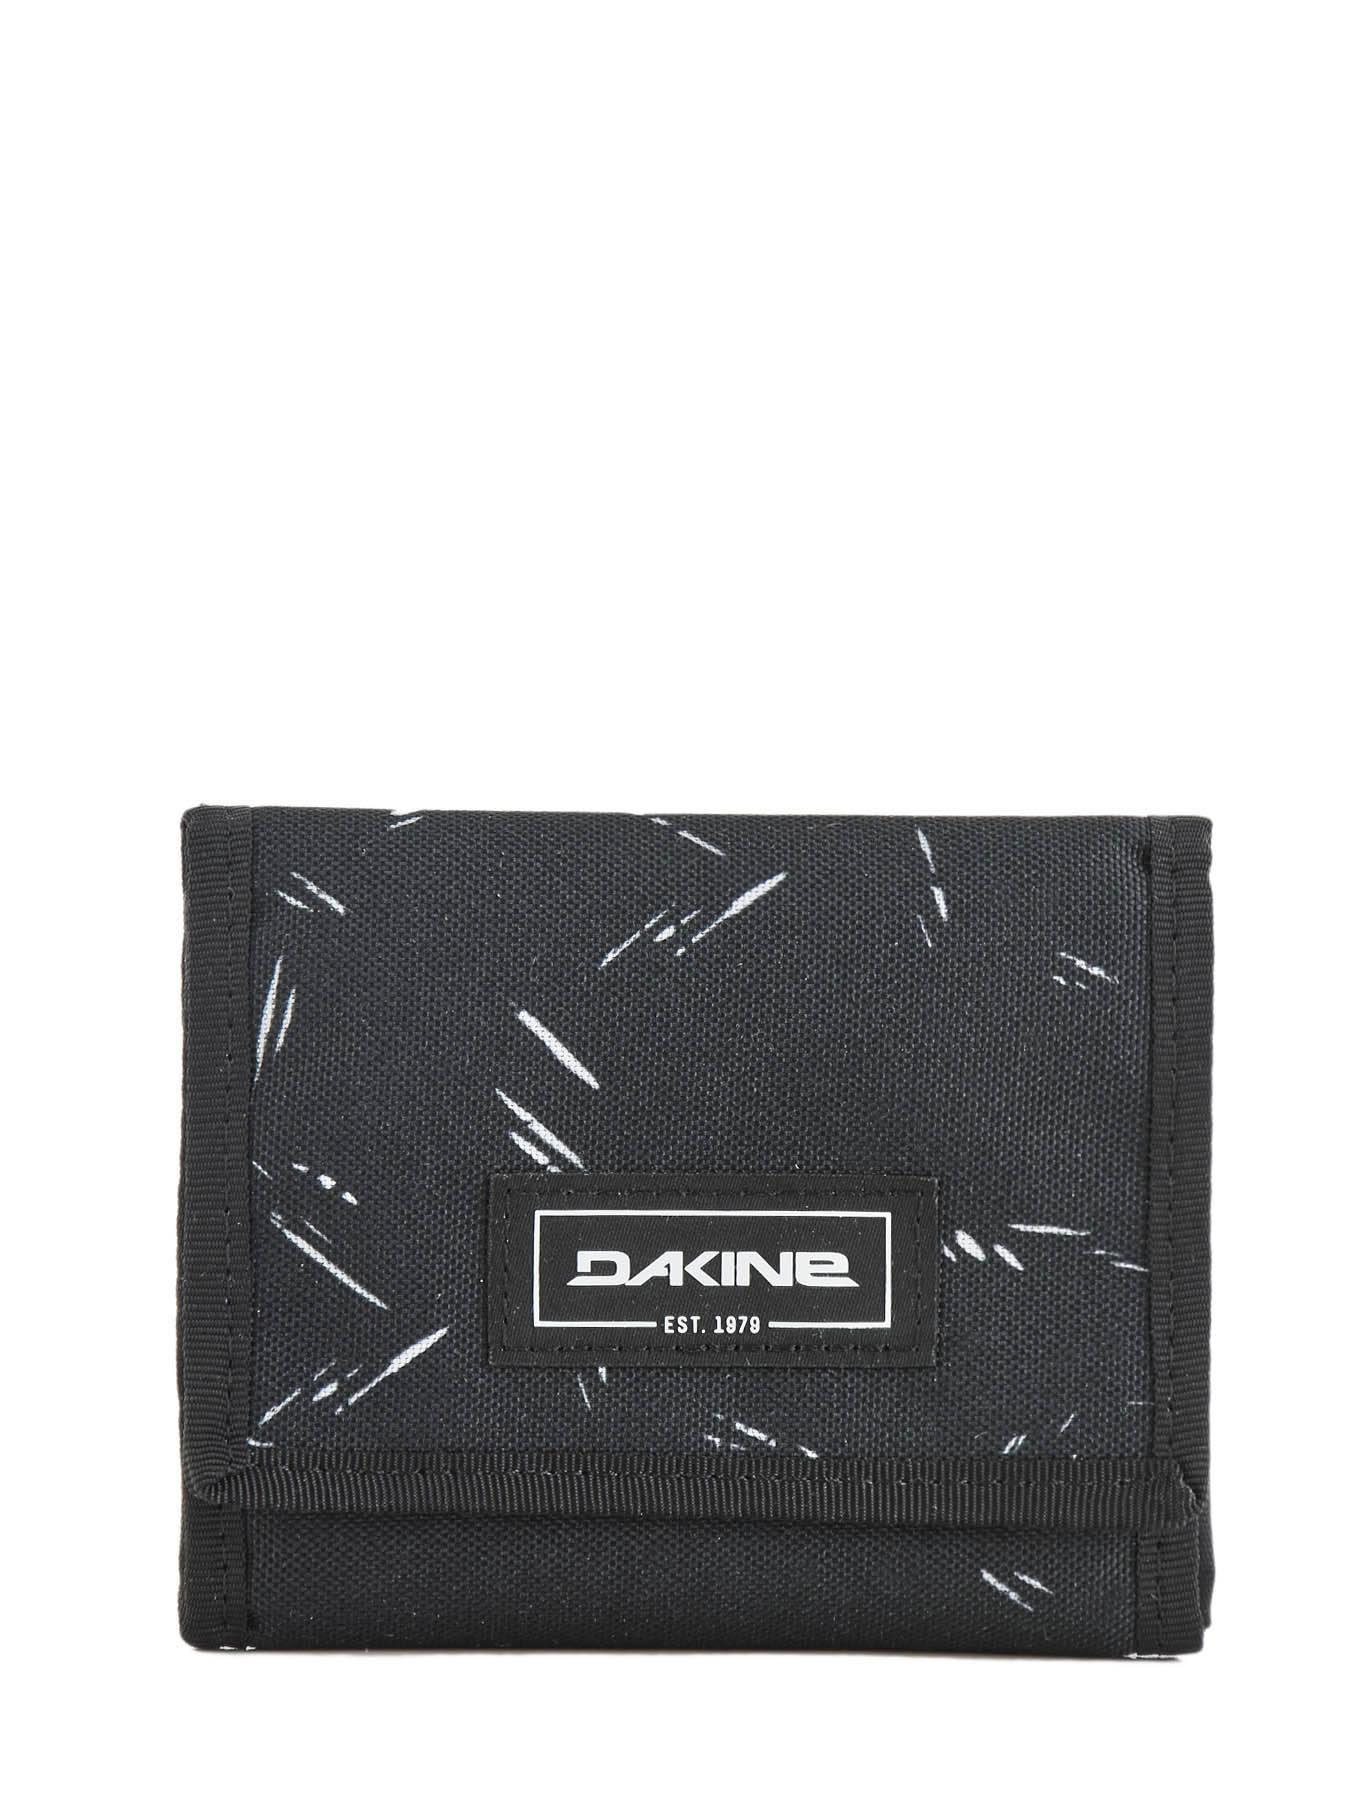 Diplomat Wallet Portefeuille Dakine Homme